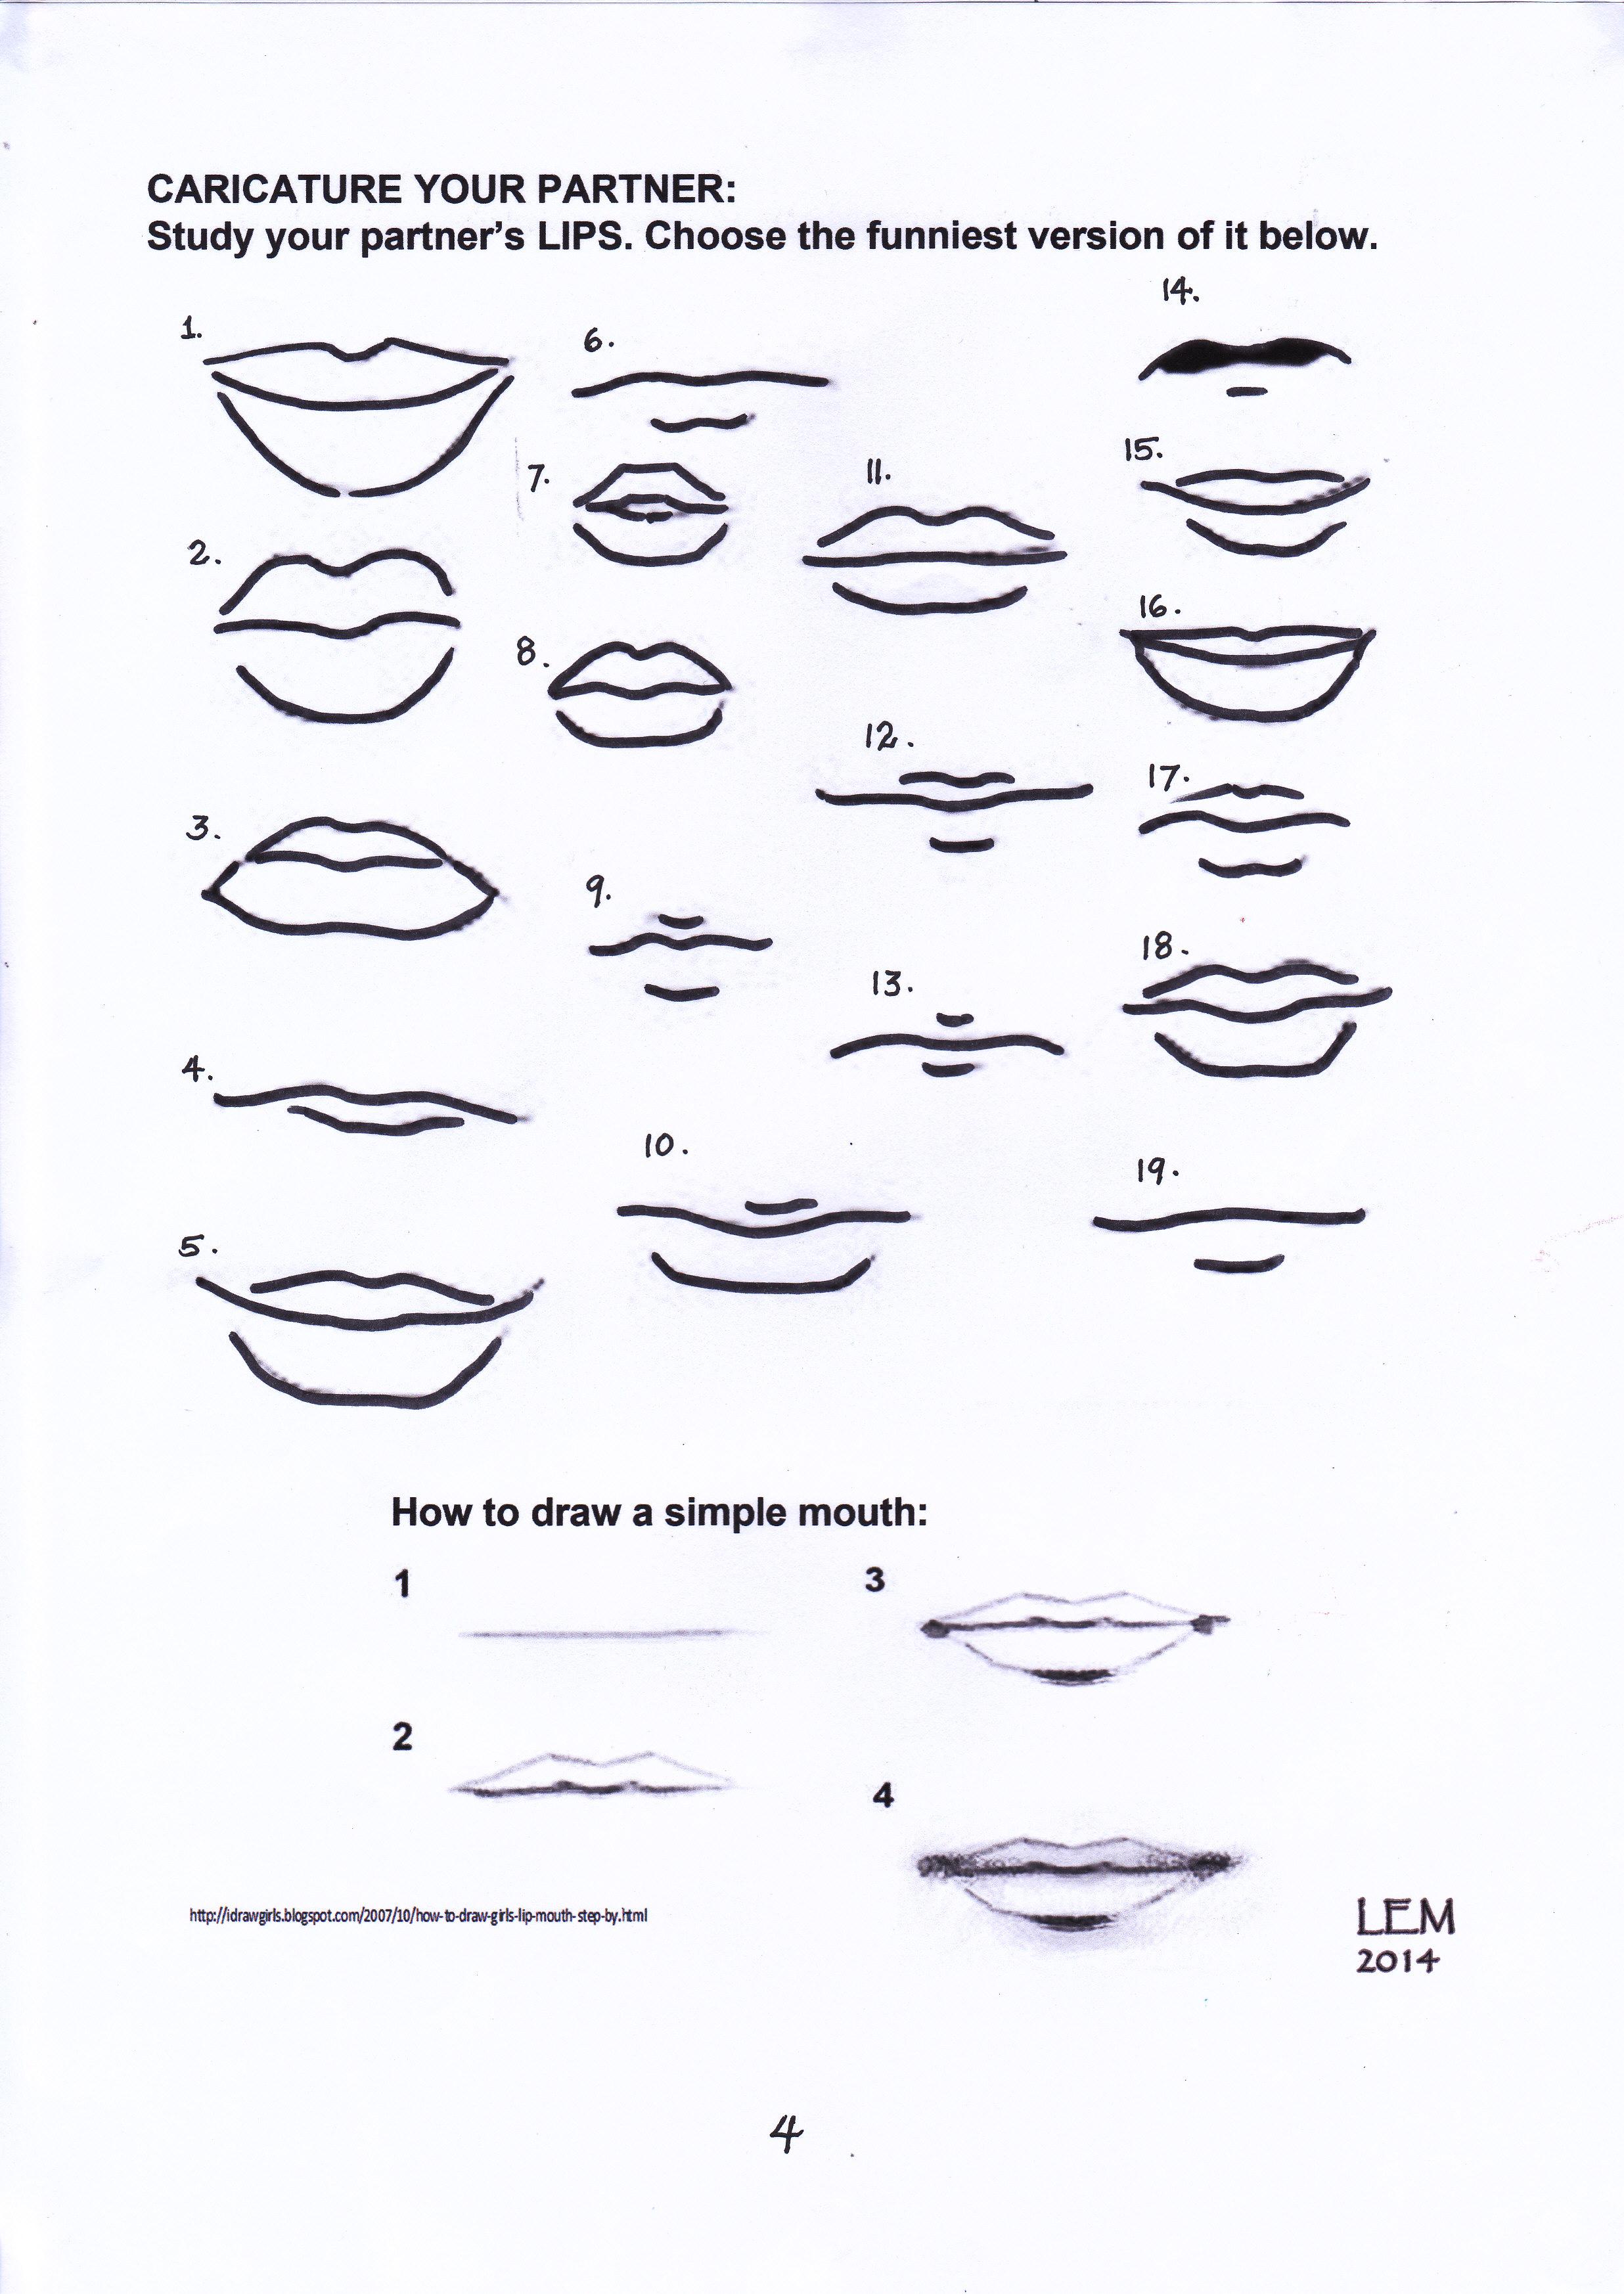 Easy Caricature Workshop